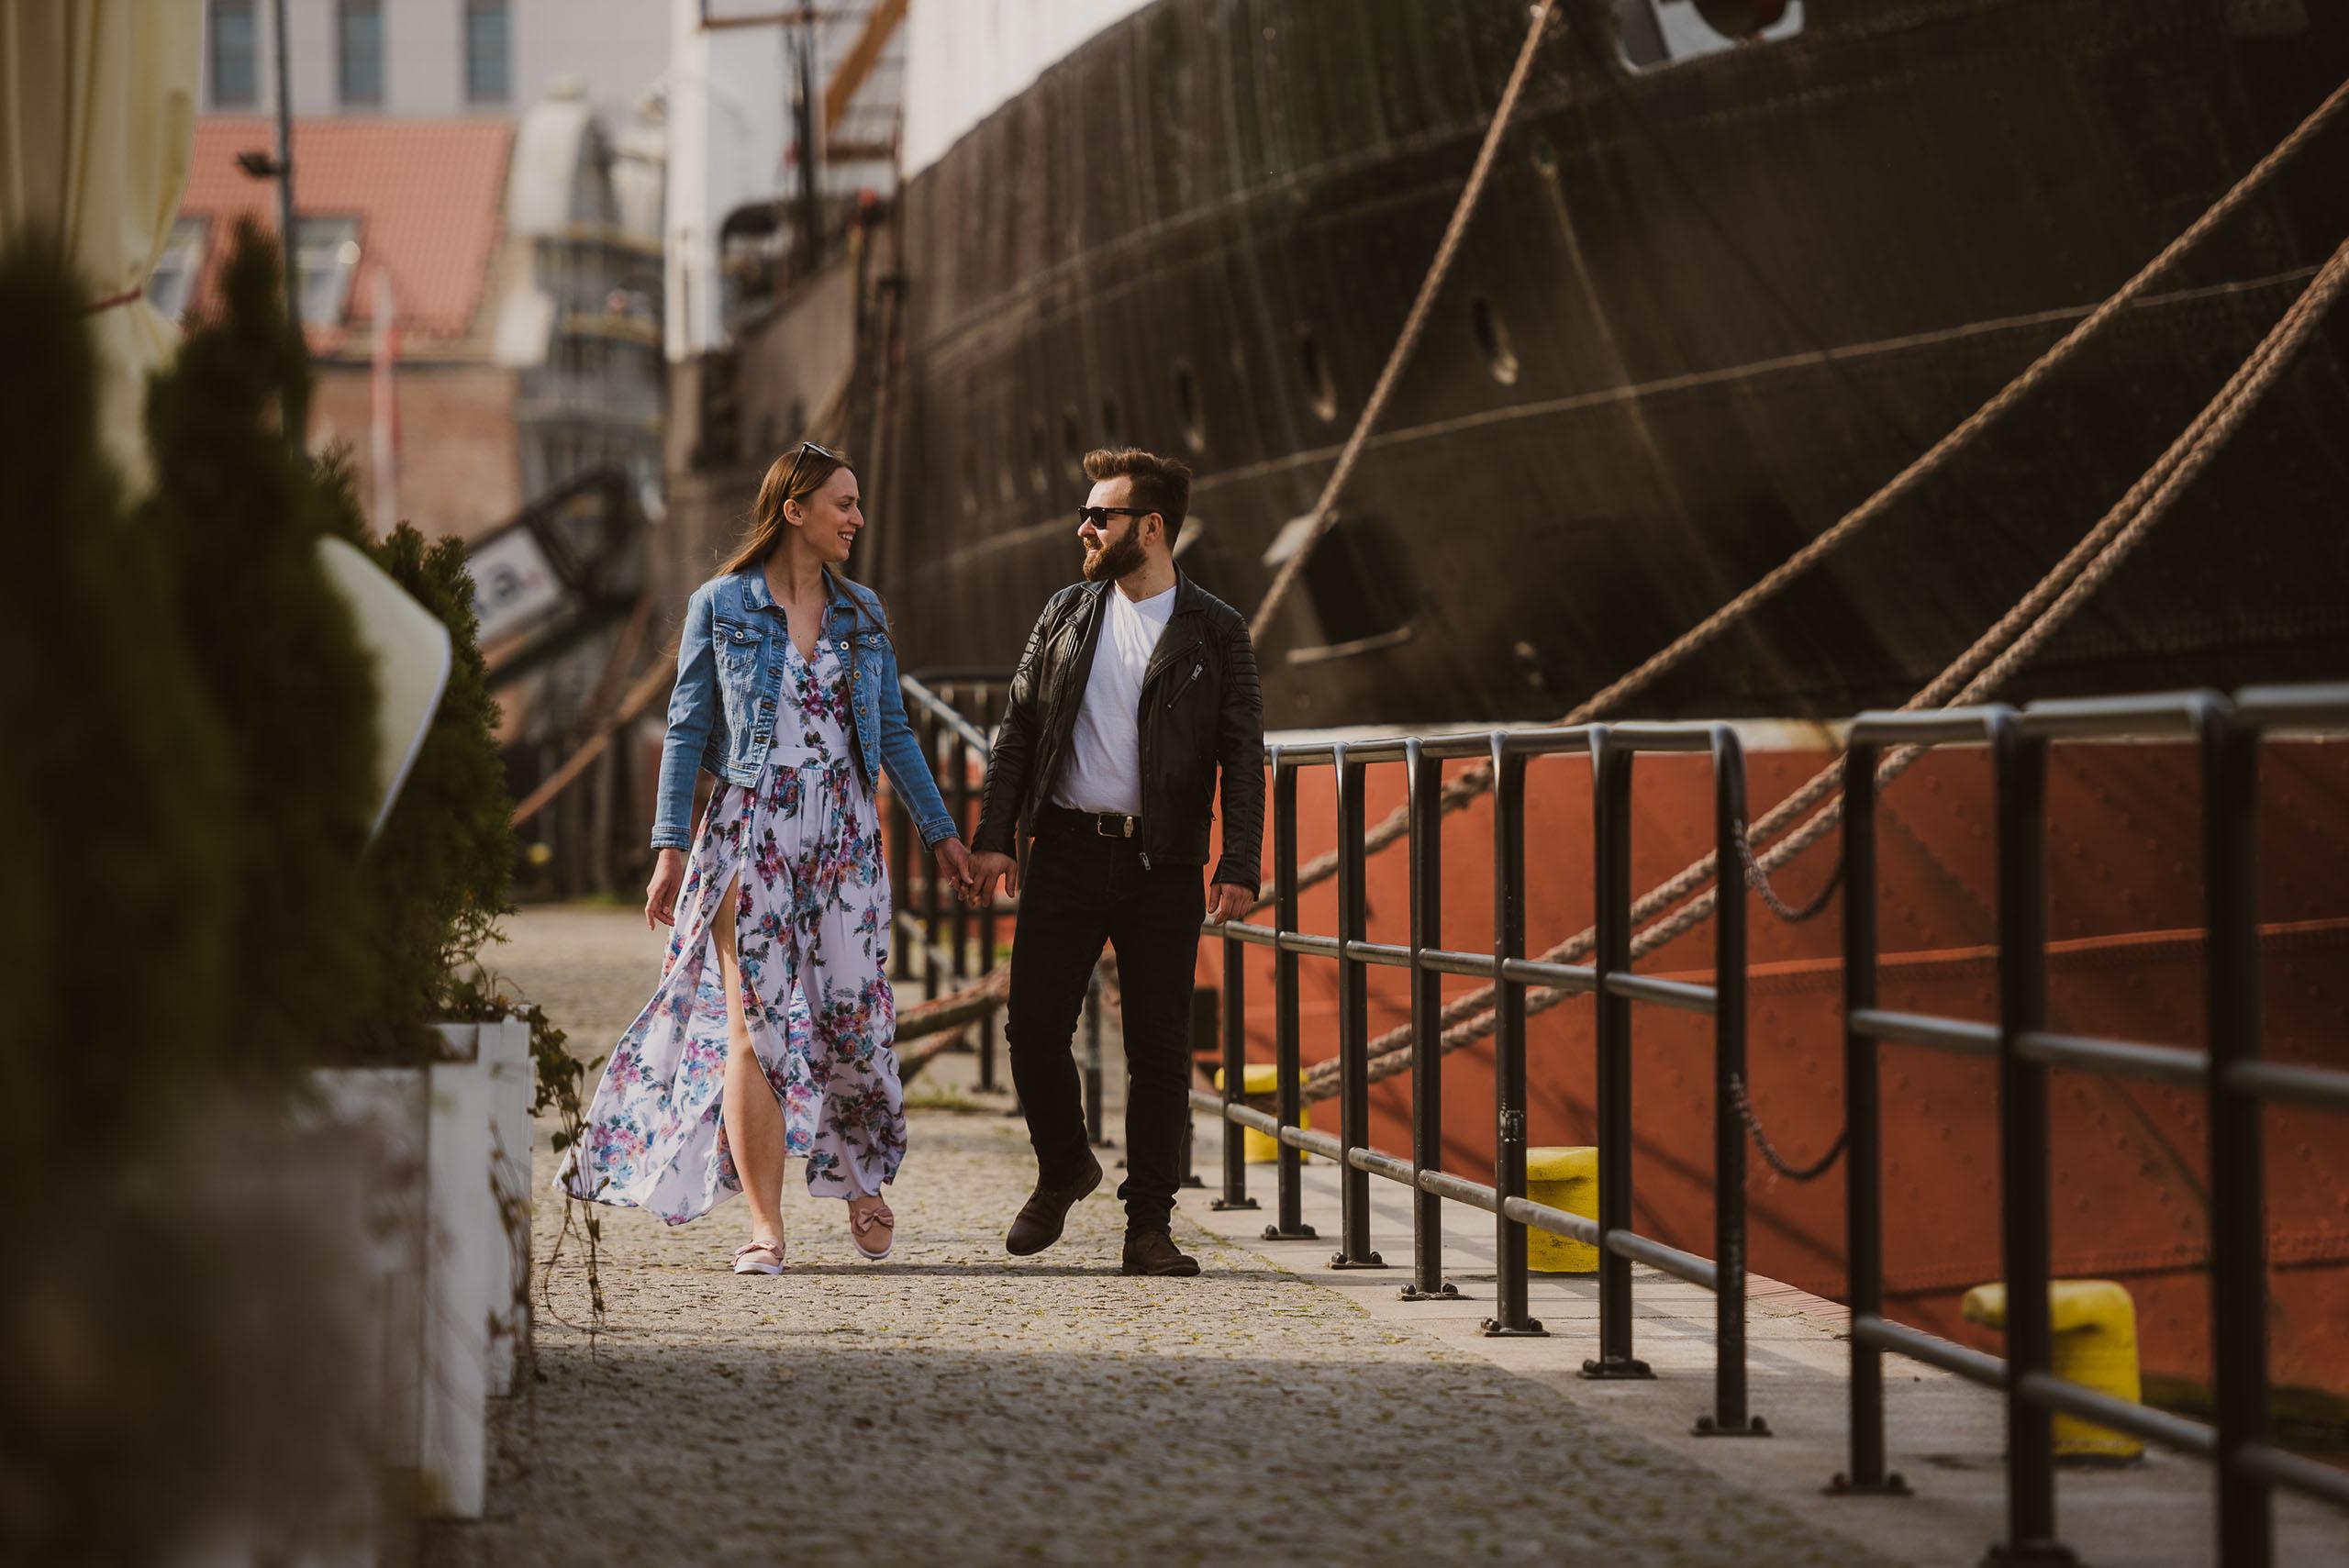 Sesja narzeczeńska Gdańsk Stare Miasto - Lovestories